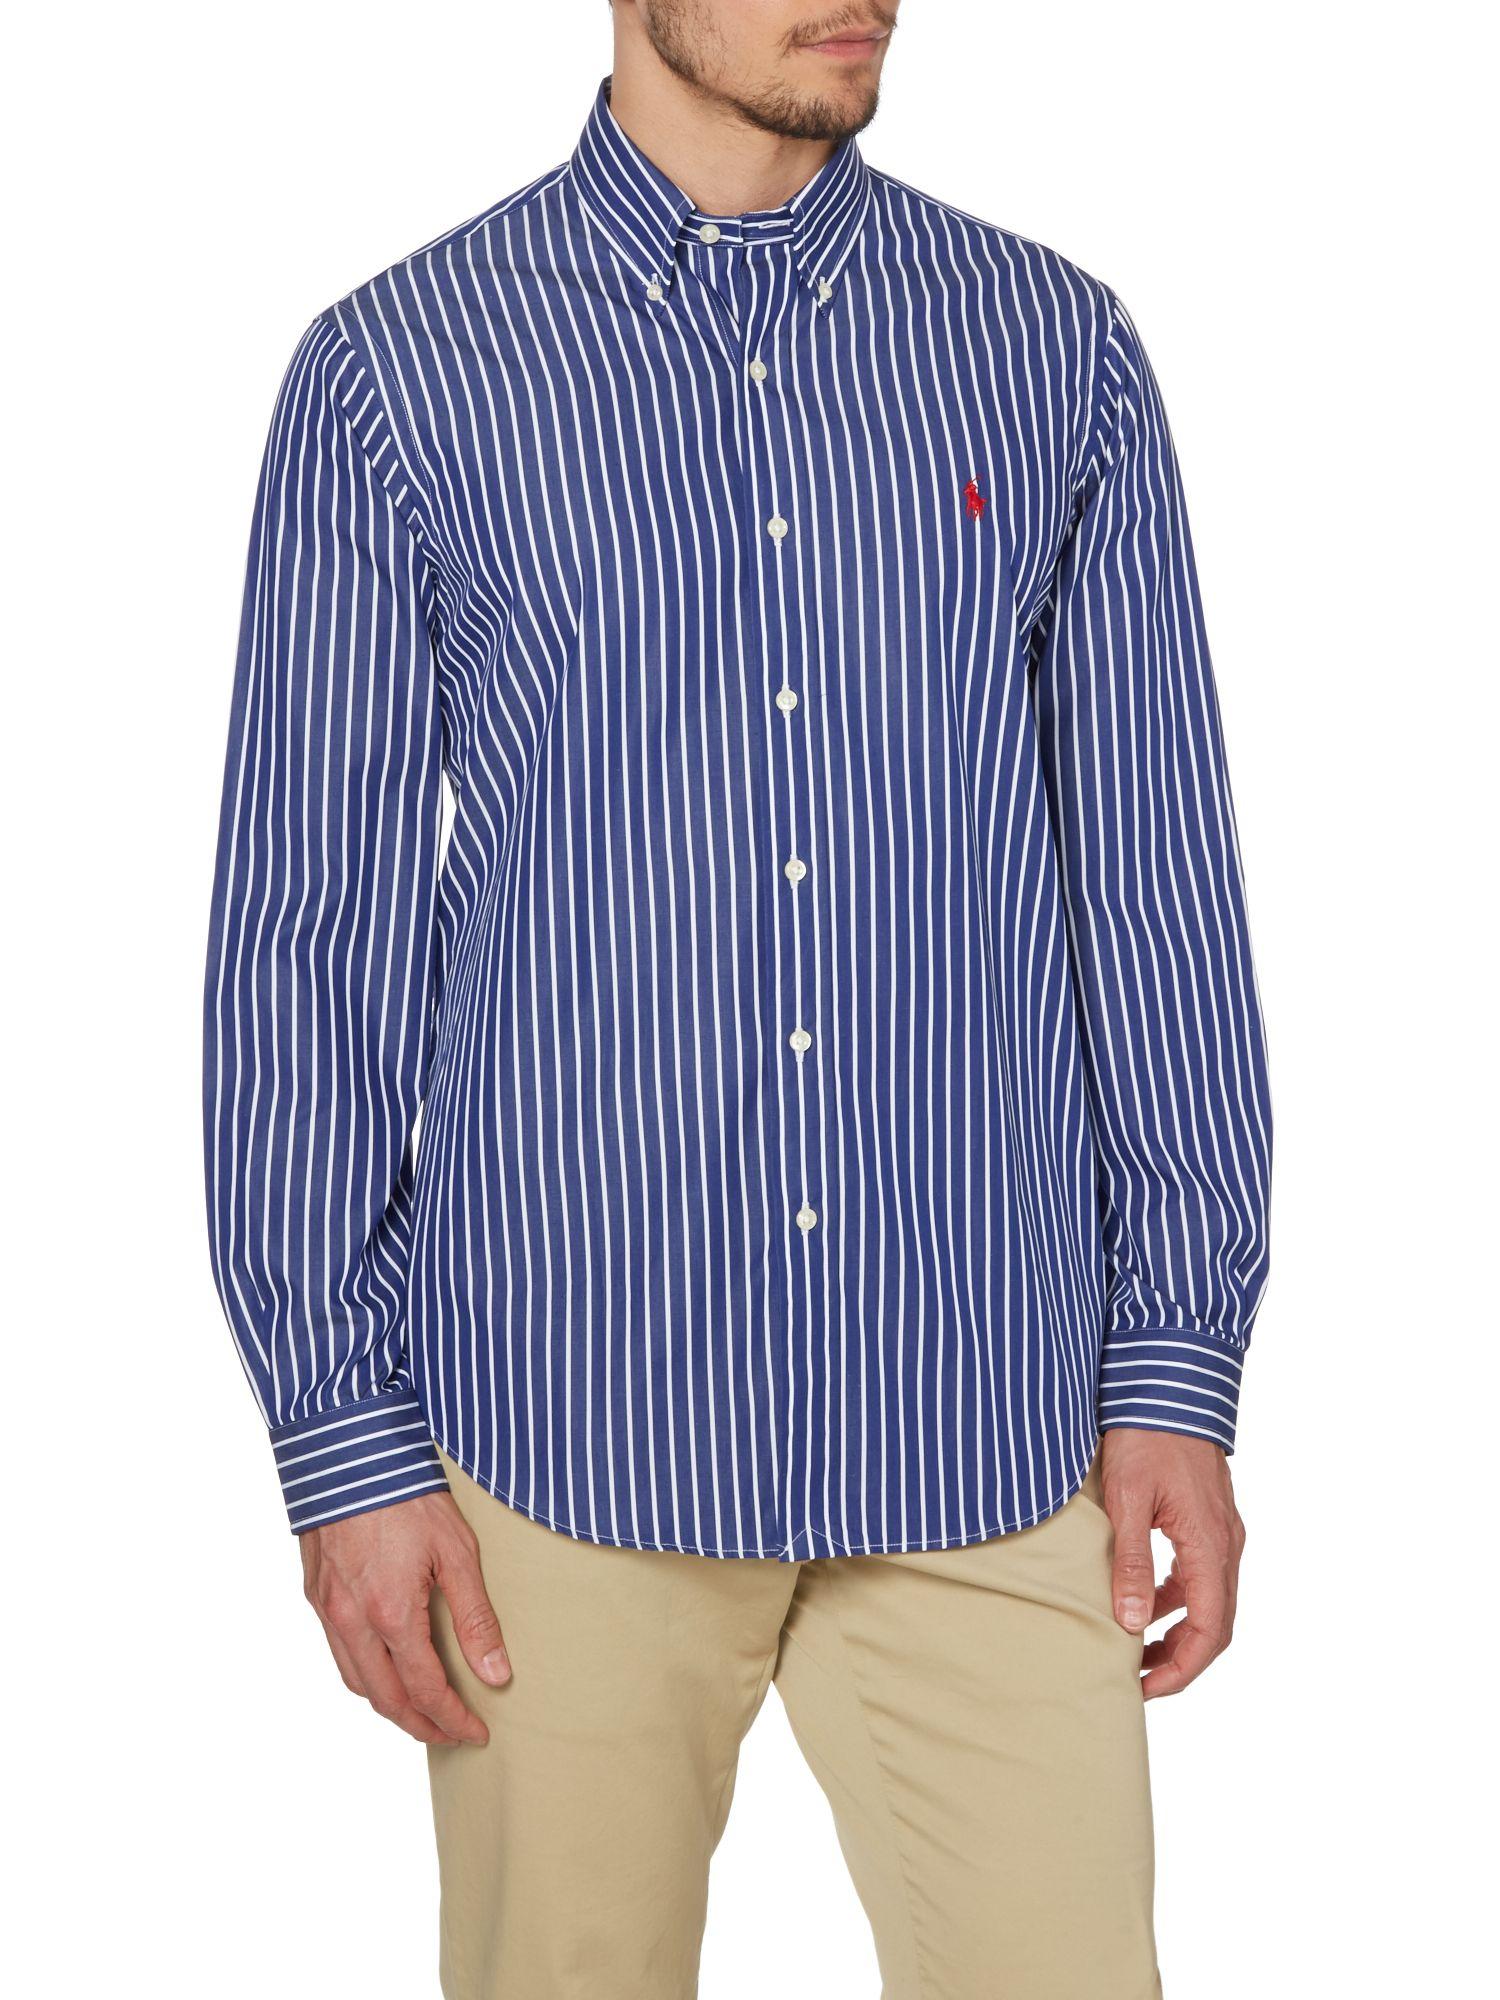 Polo ralph lauren Striped Long Sleeve Button Down Collar Shirt in ...